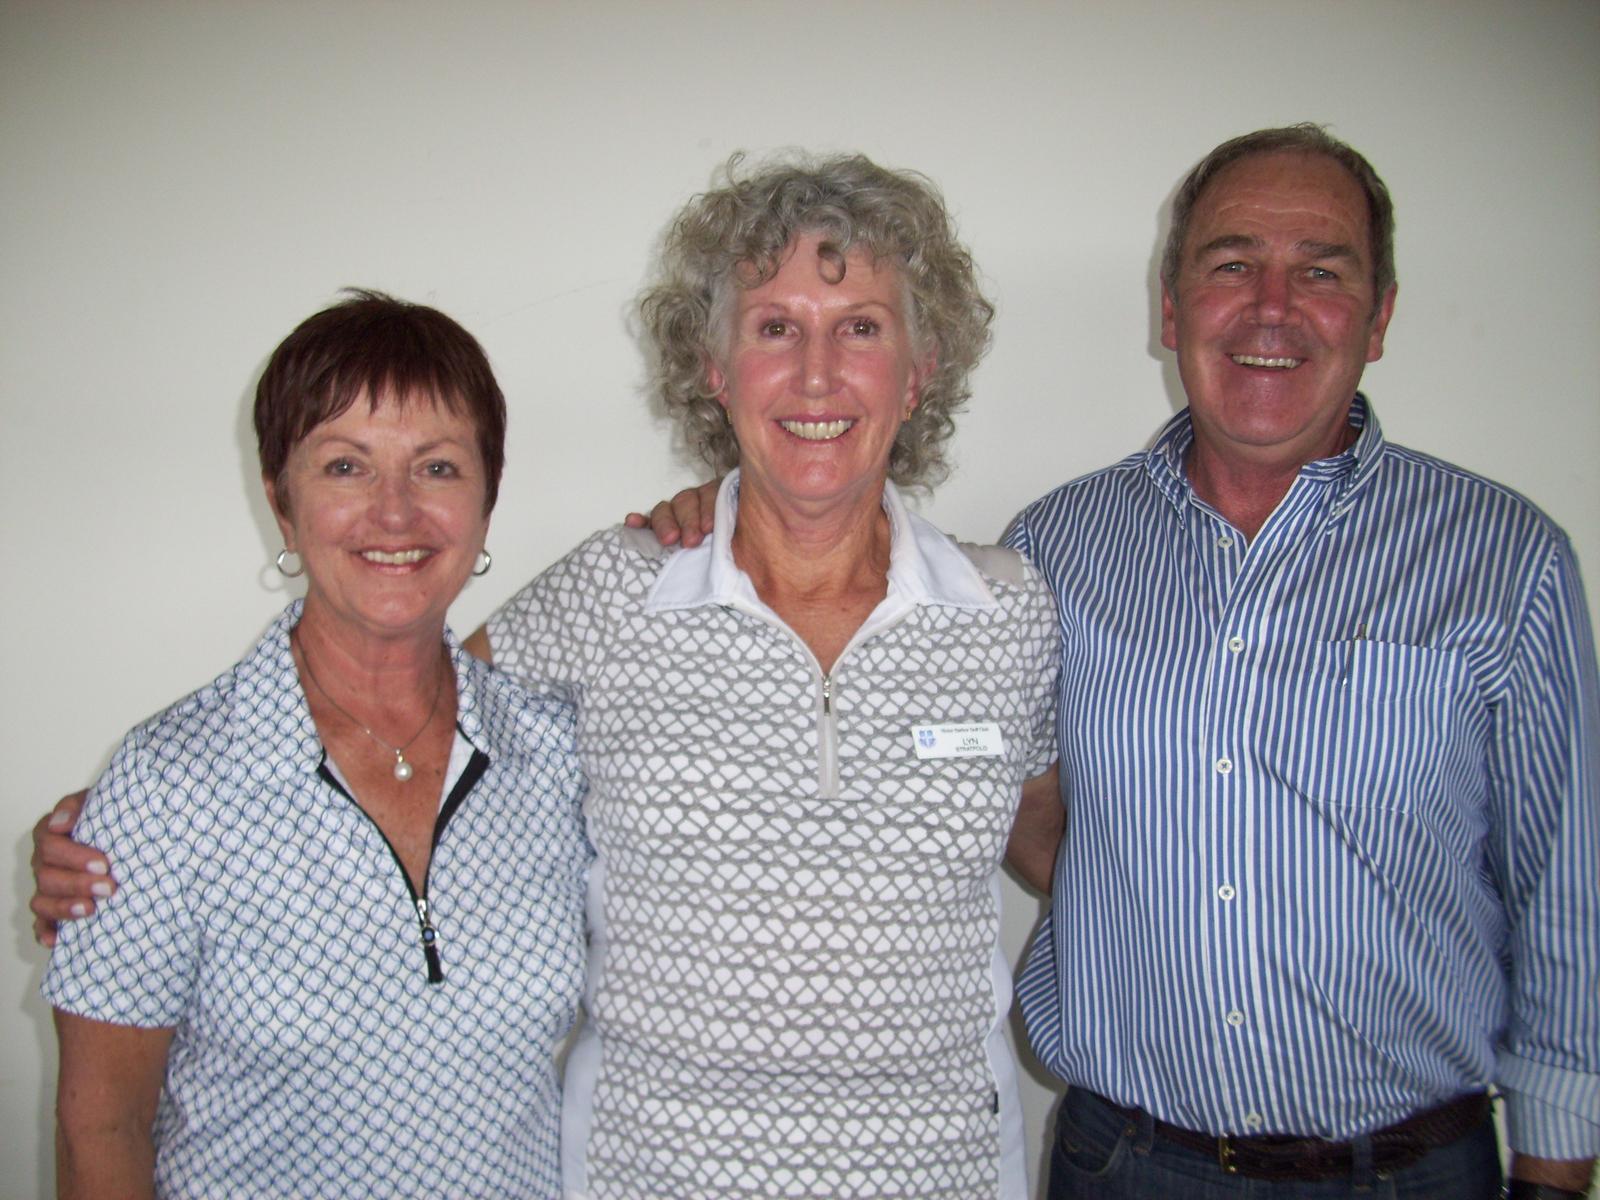 Lyn Stratfold (centre) with sponsors, Bev & Alan Kluske of Mr Menswear